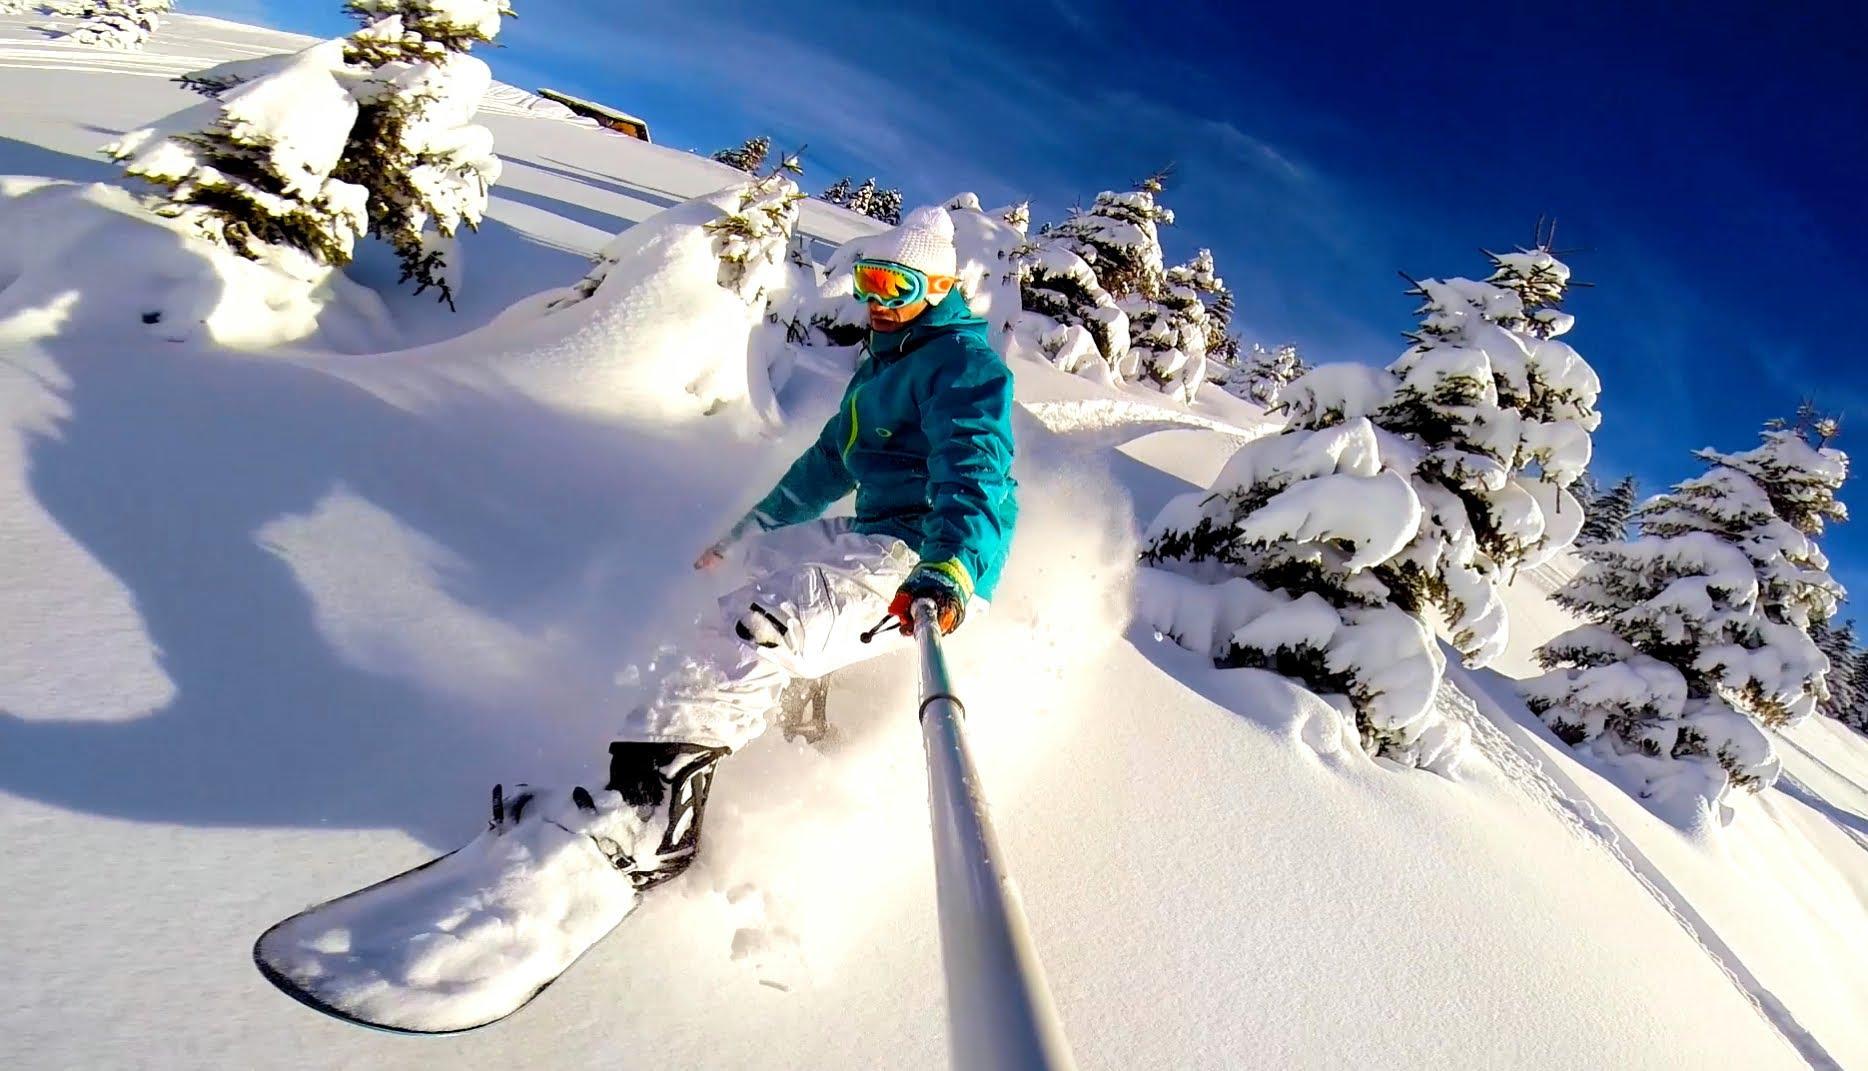 The Art of Ride - Snowboarding Off Piste Backcountry - DJI Phantom 2 ...